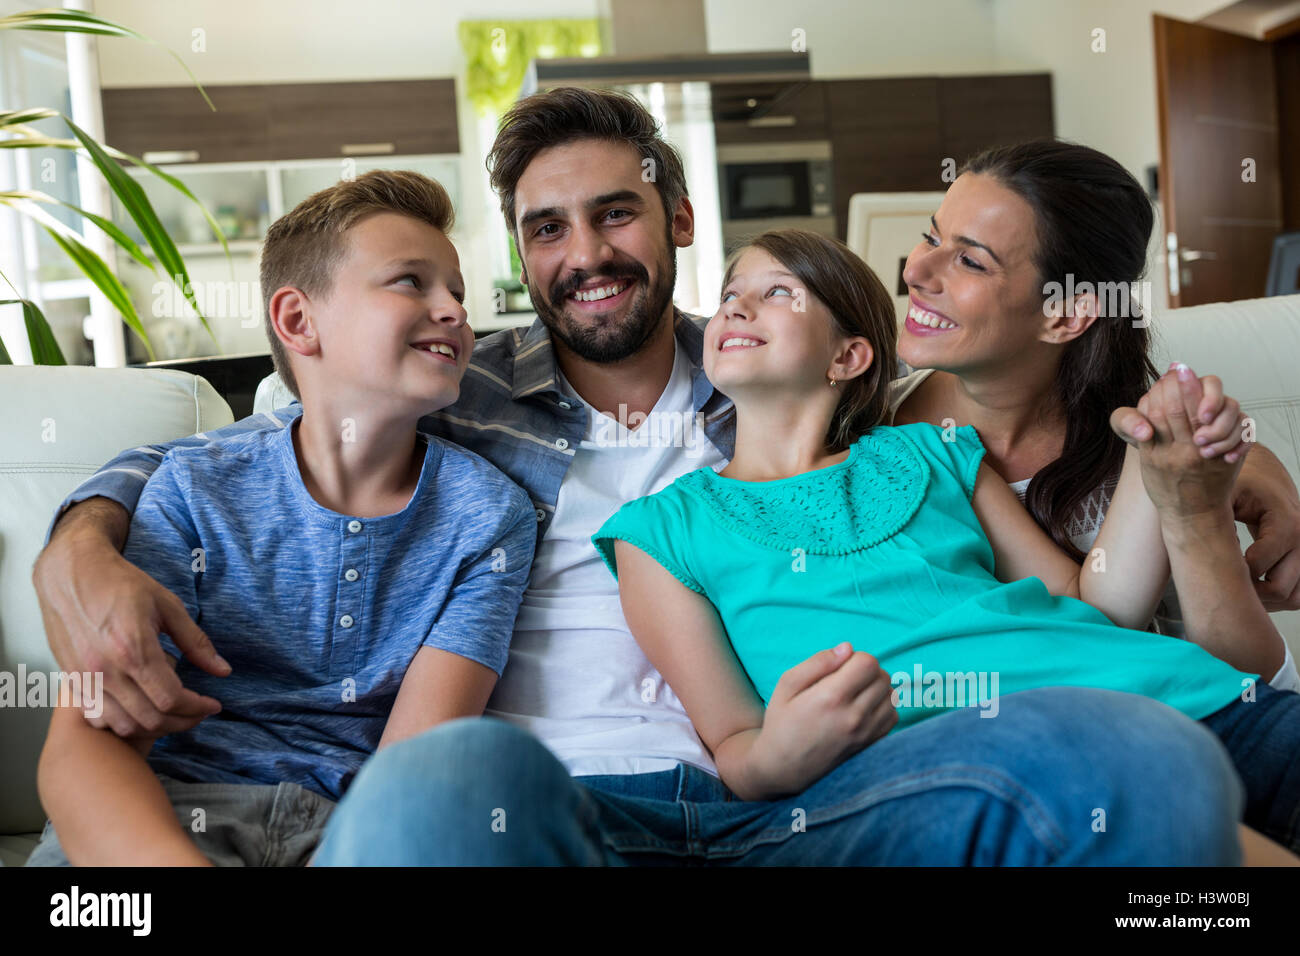 Happy family sitting with arm around on sofa - Stock Image